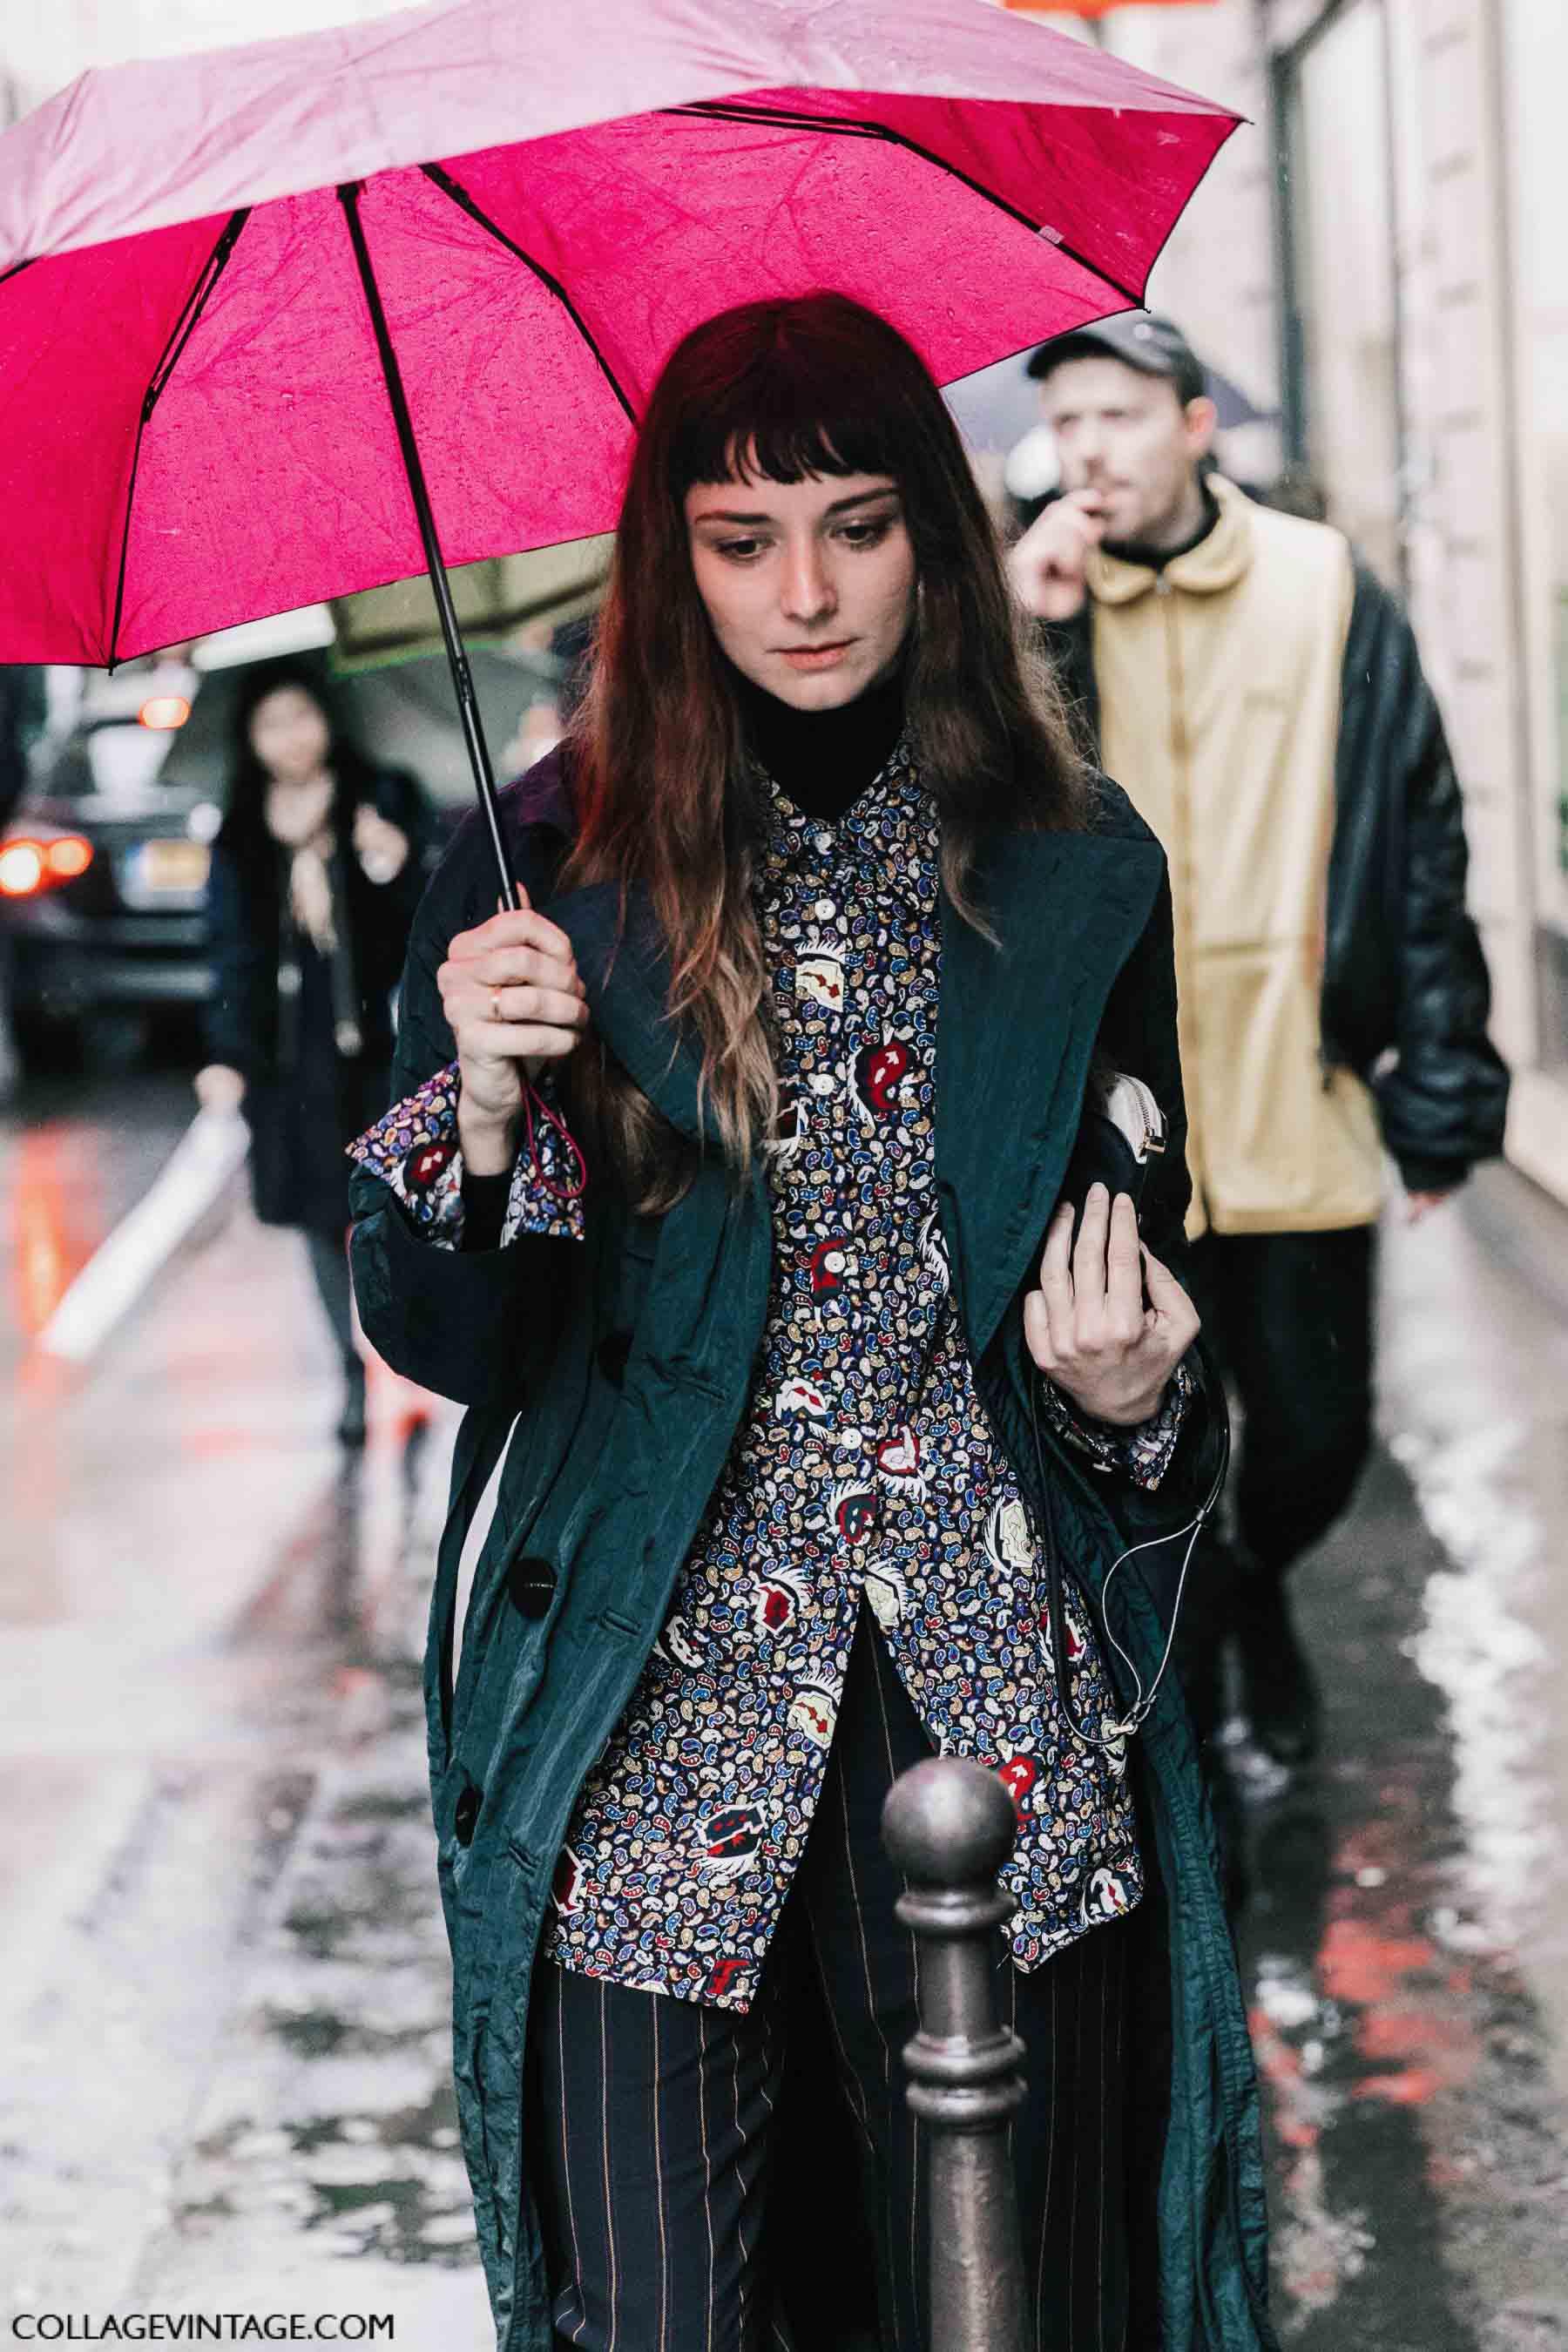 Рубашка с принтом, парижский гардероб, parisian chic, parisian street style